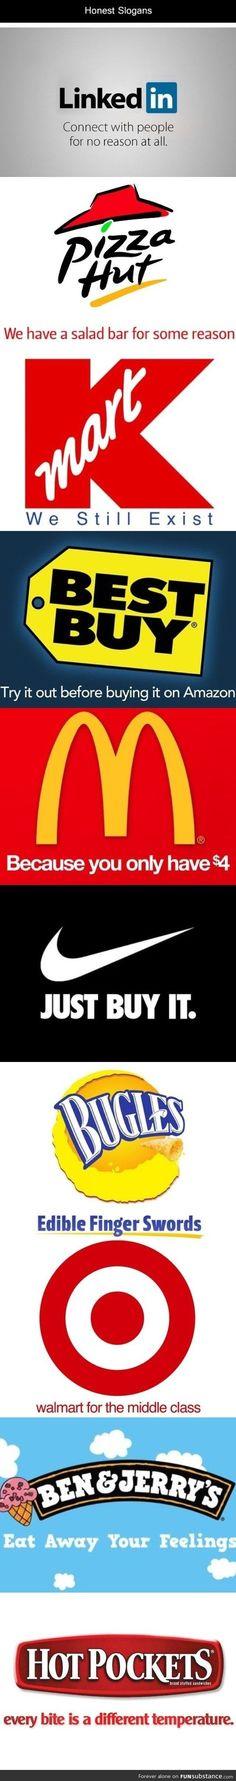 more honest company slogans...